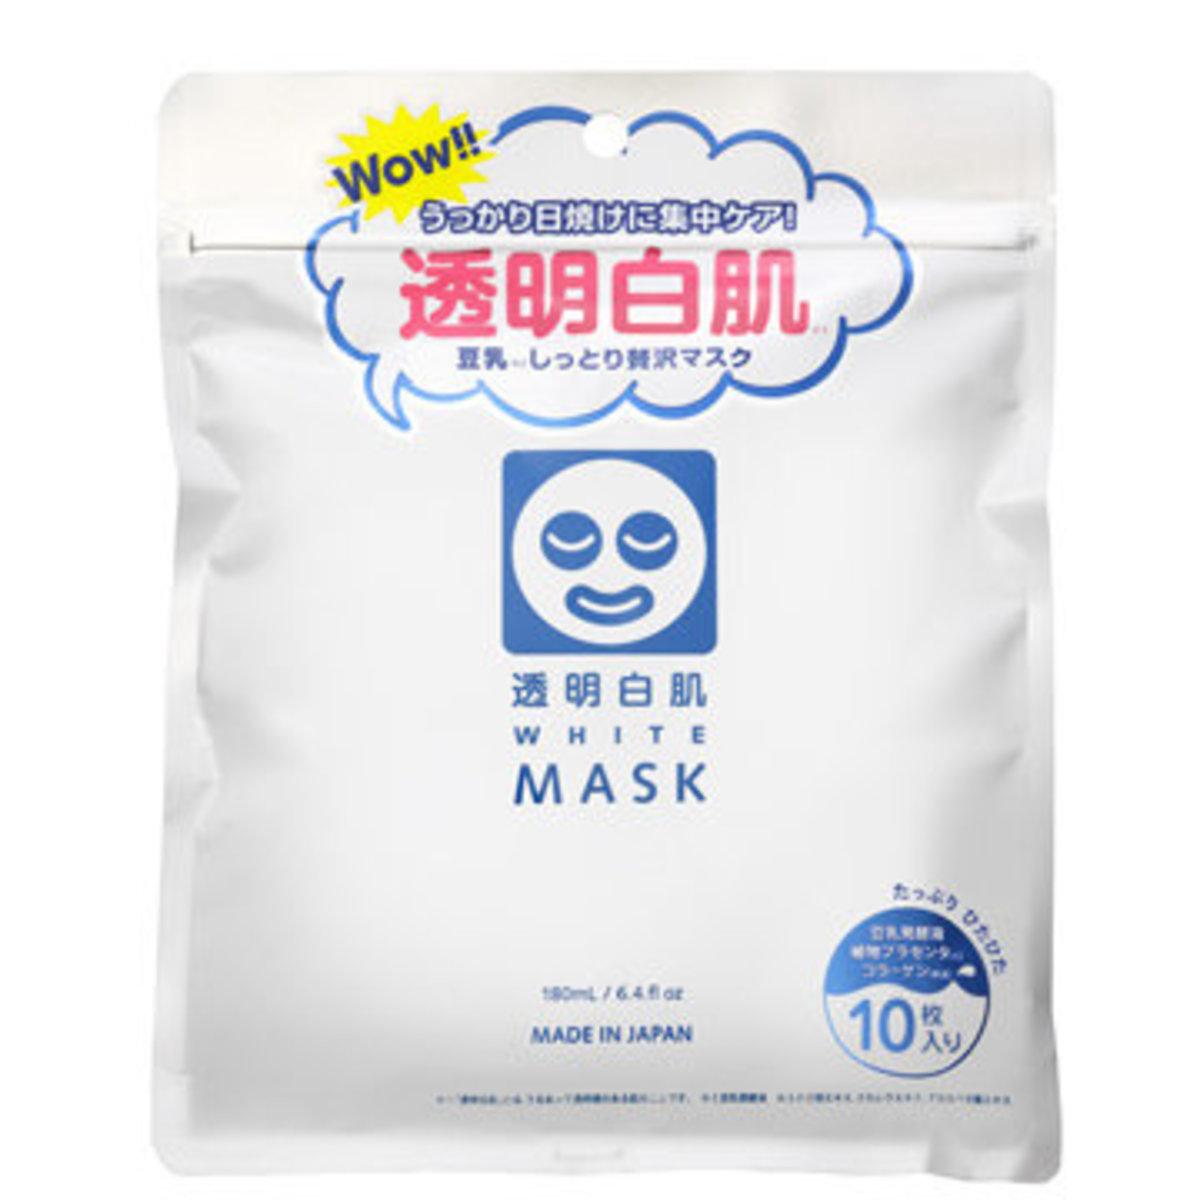 ISHIZAWA LAB - White Mask 10PCS/BAG X 2【Parallel Import Product】